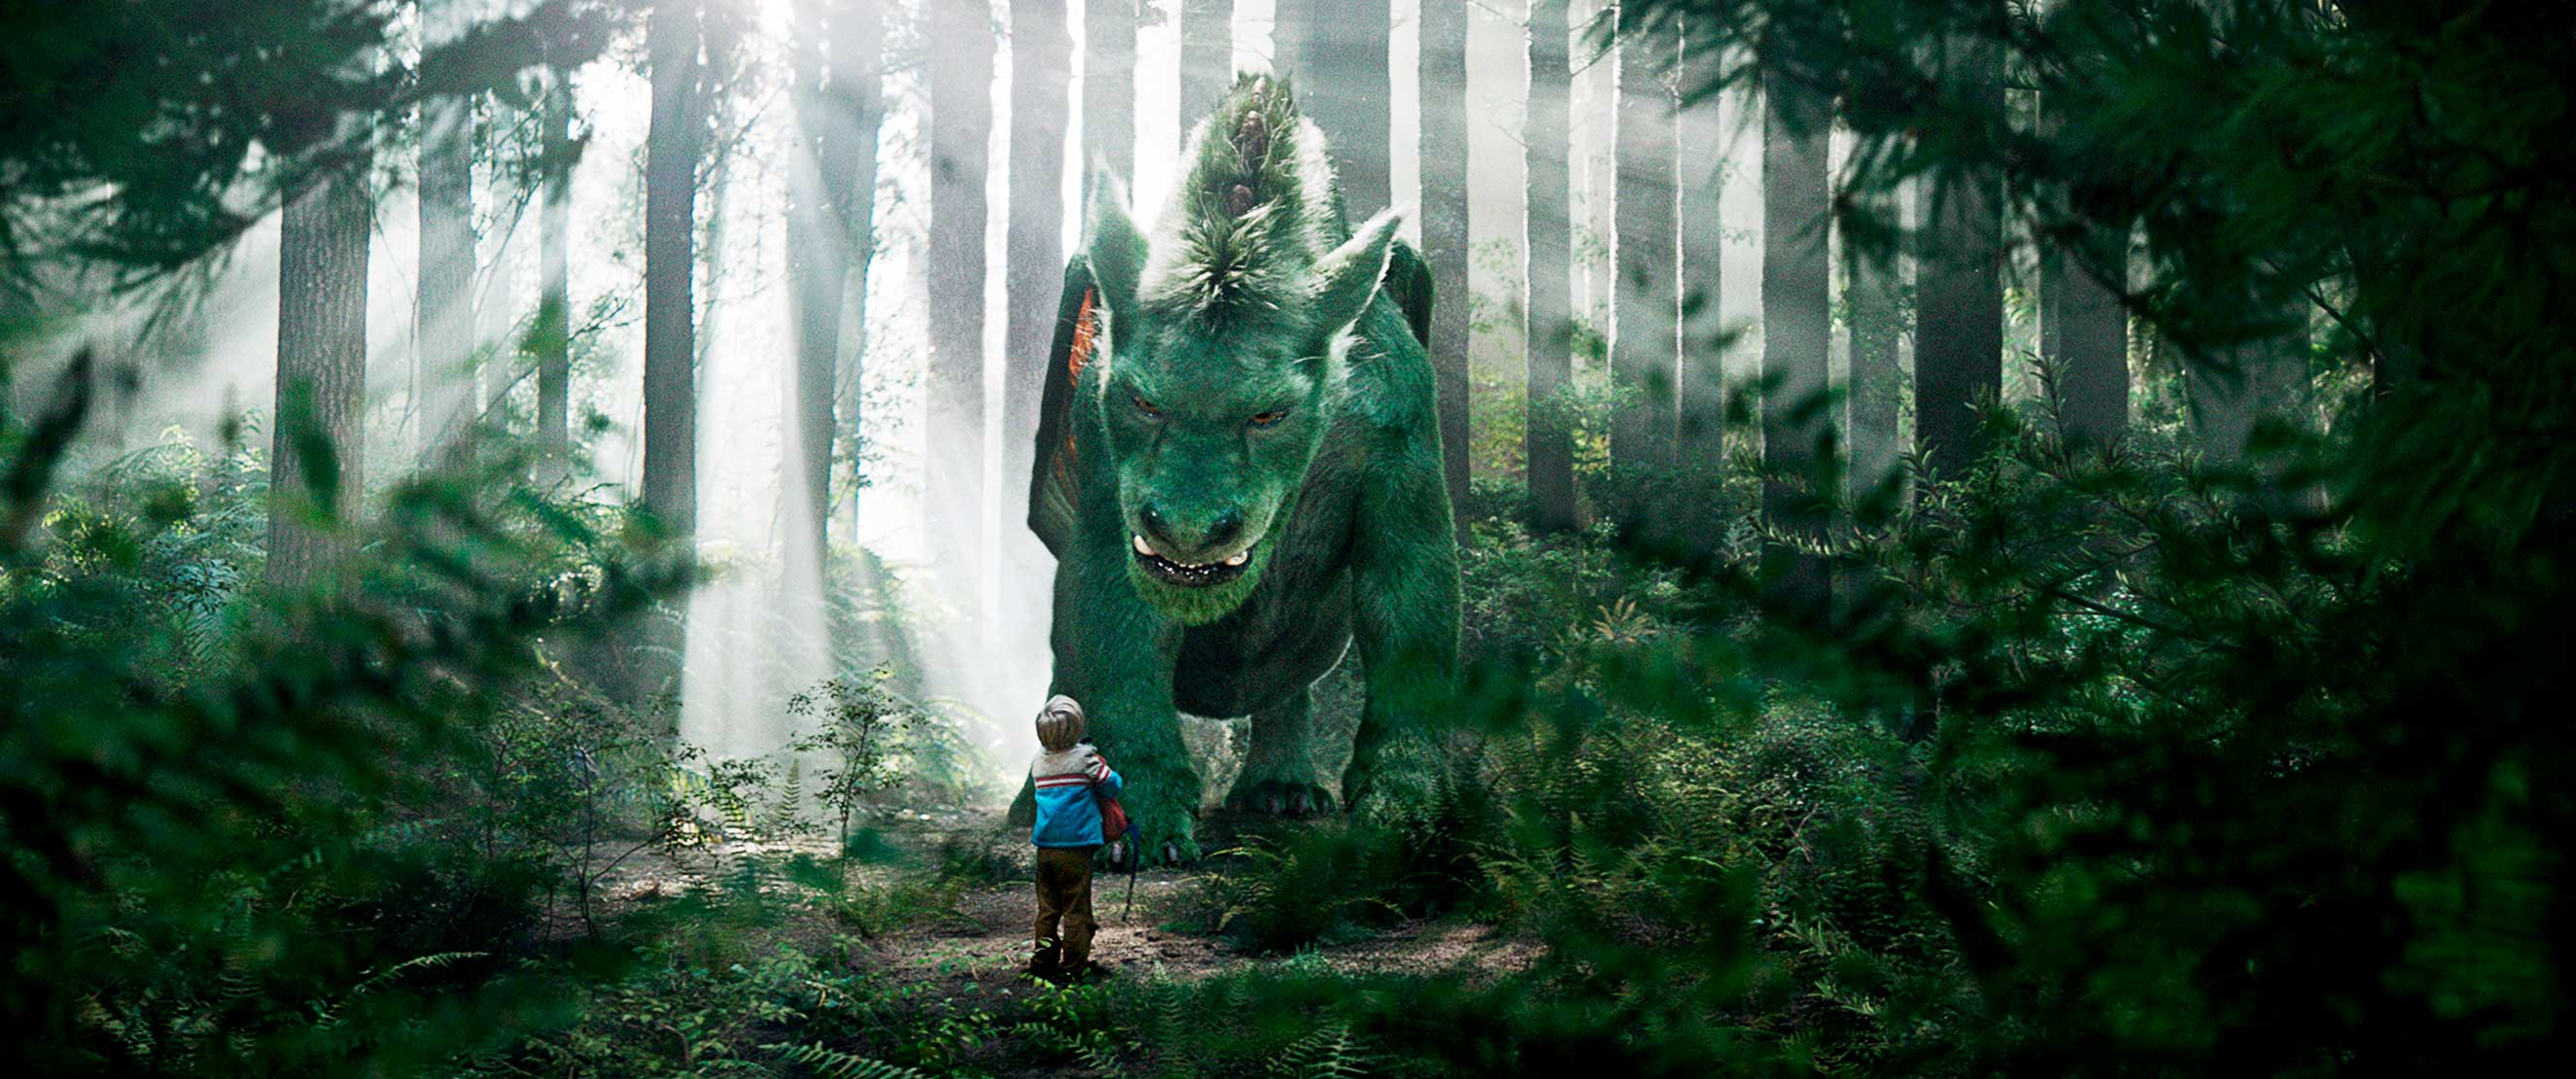 Pete's Dragon soars before it stumbles.